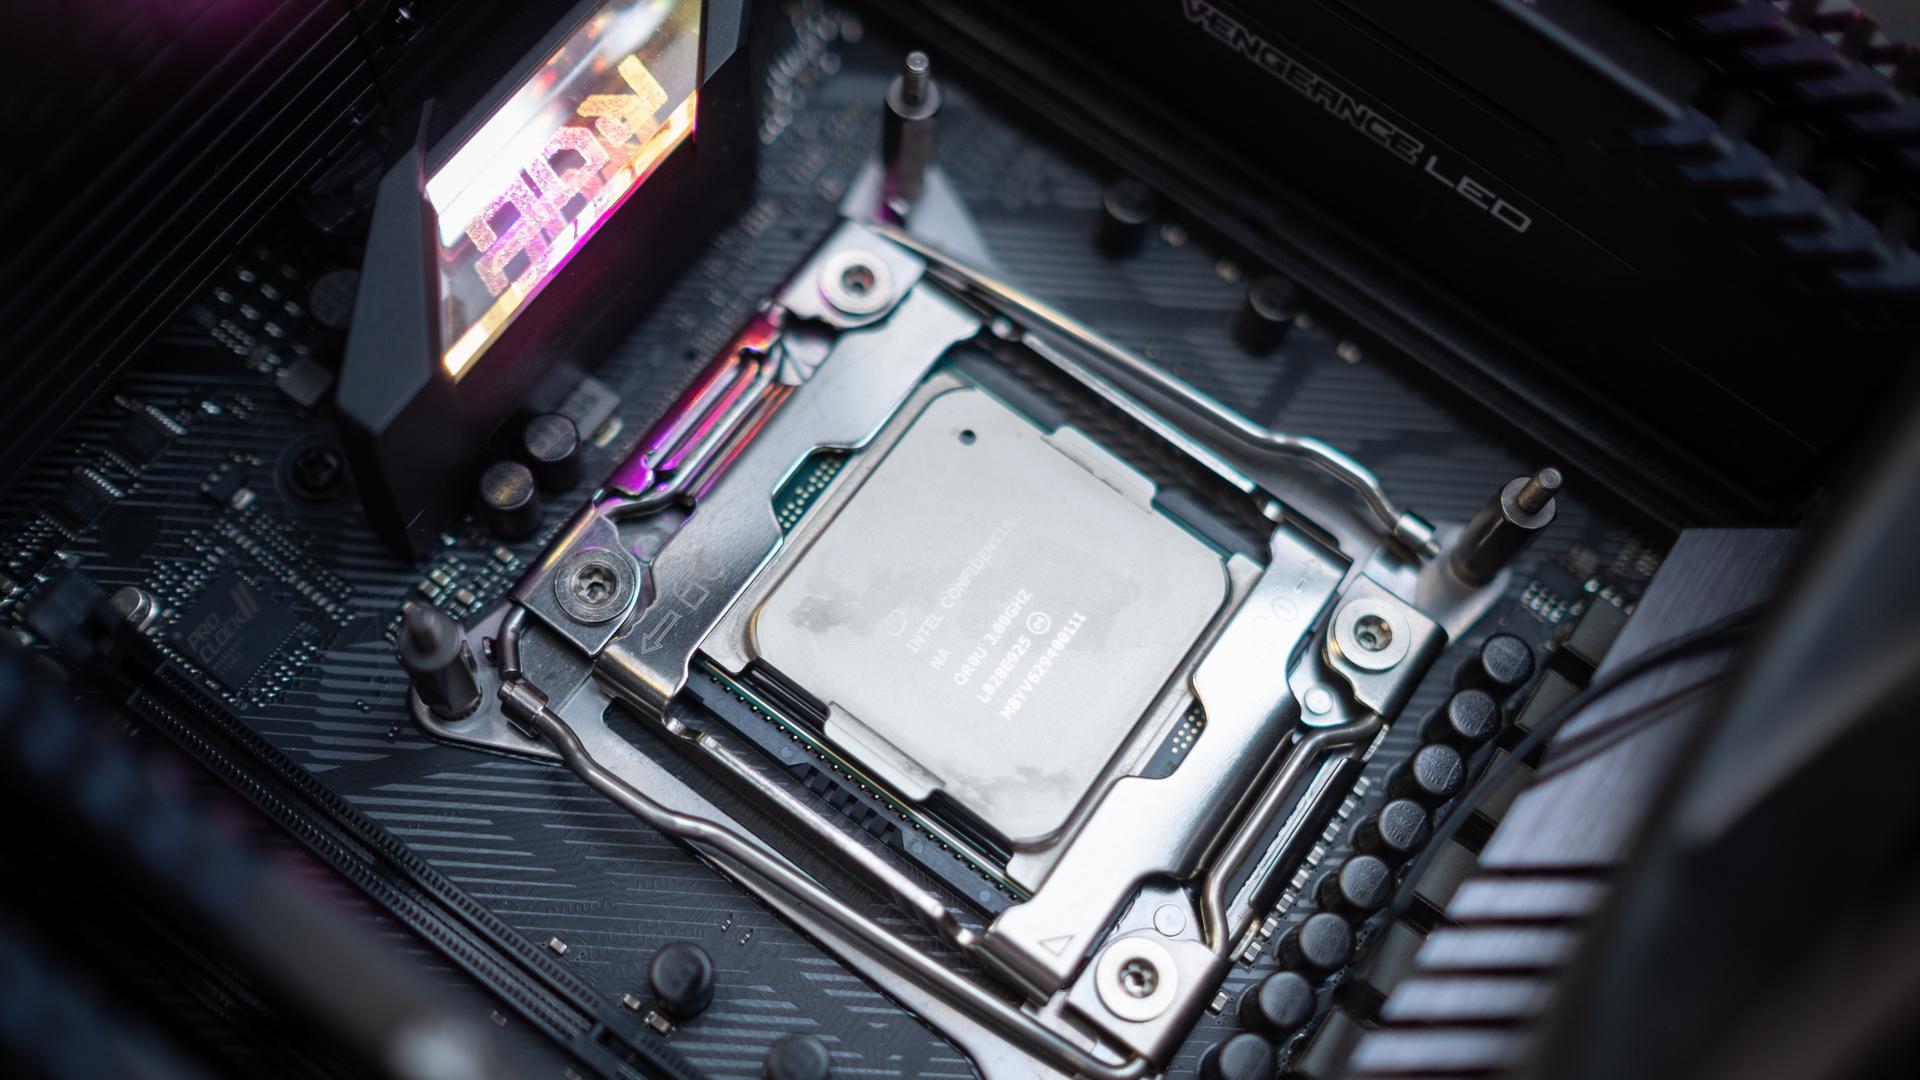 Intel Core i9-9980XE review | TechRadar